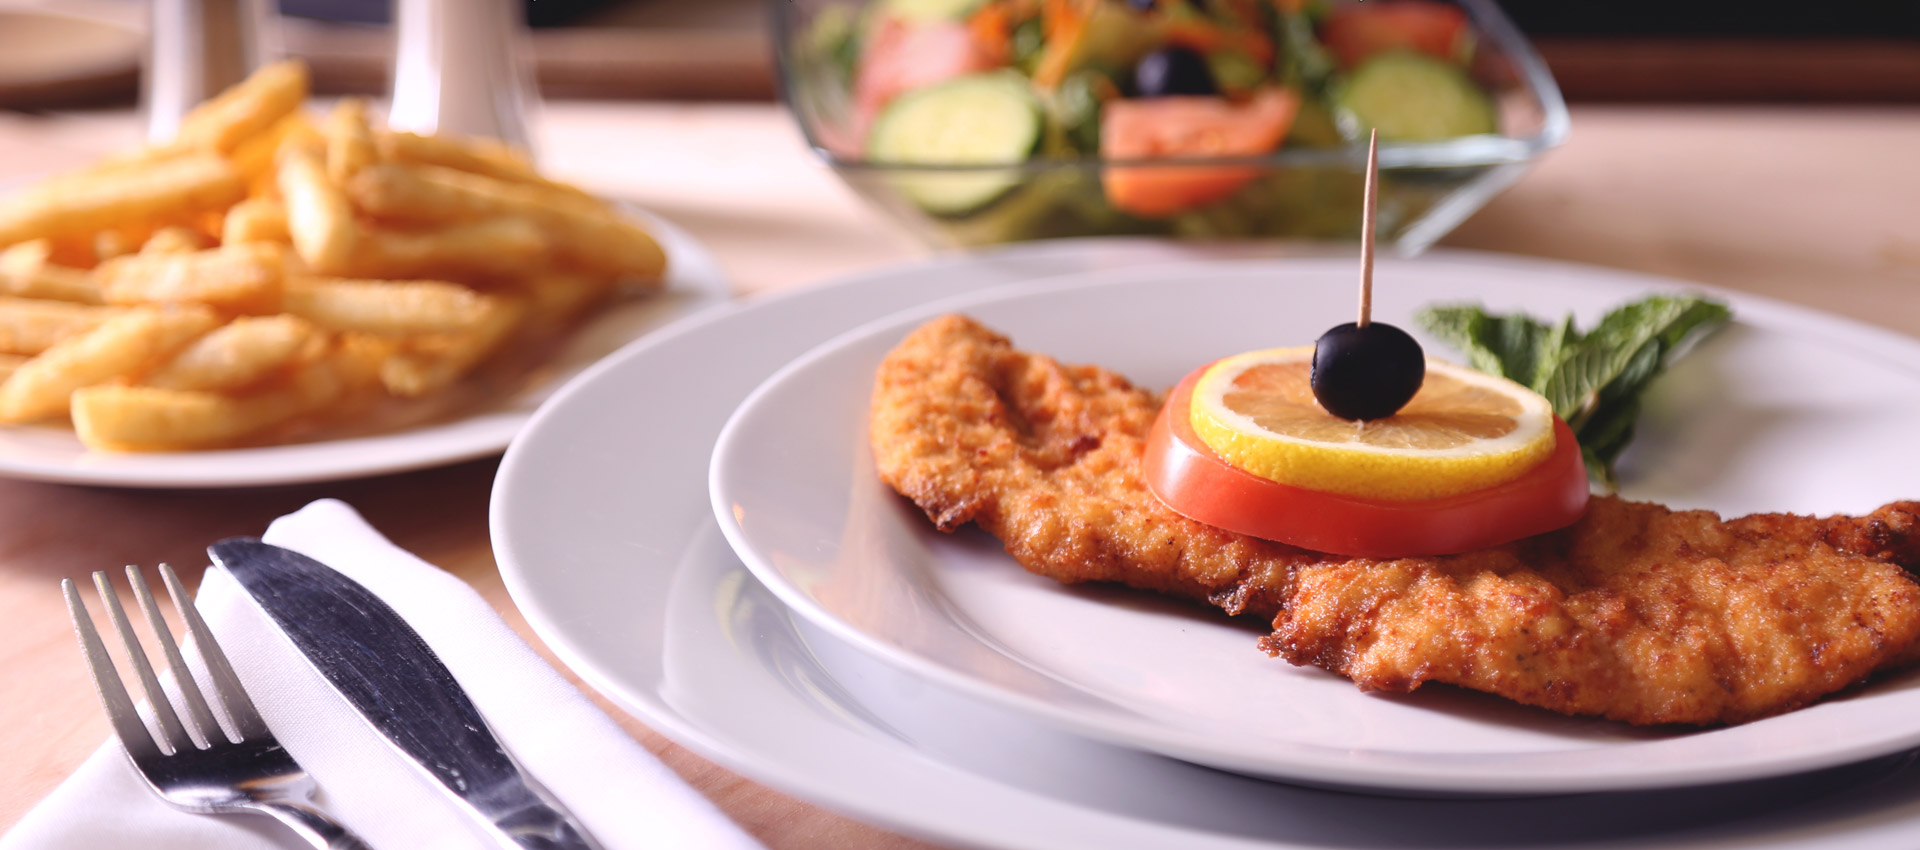 chicken-schnitzel-Zad-website